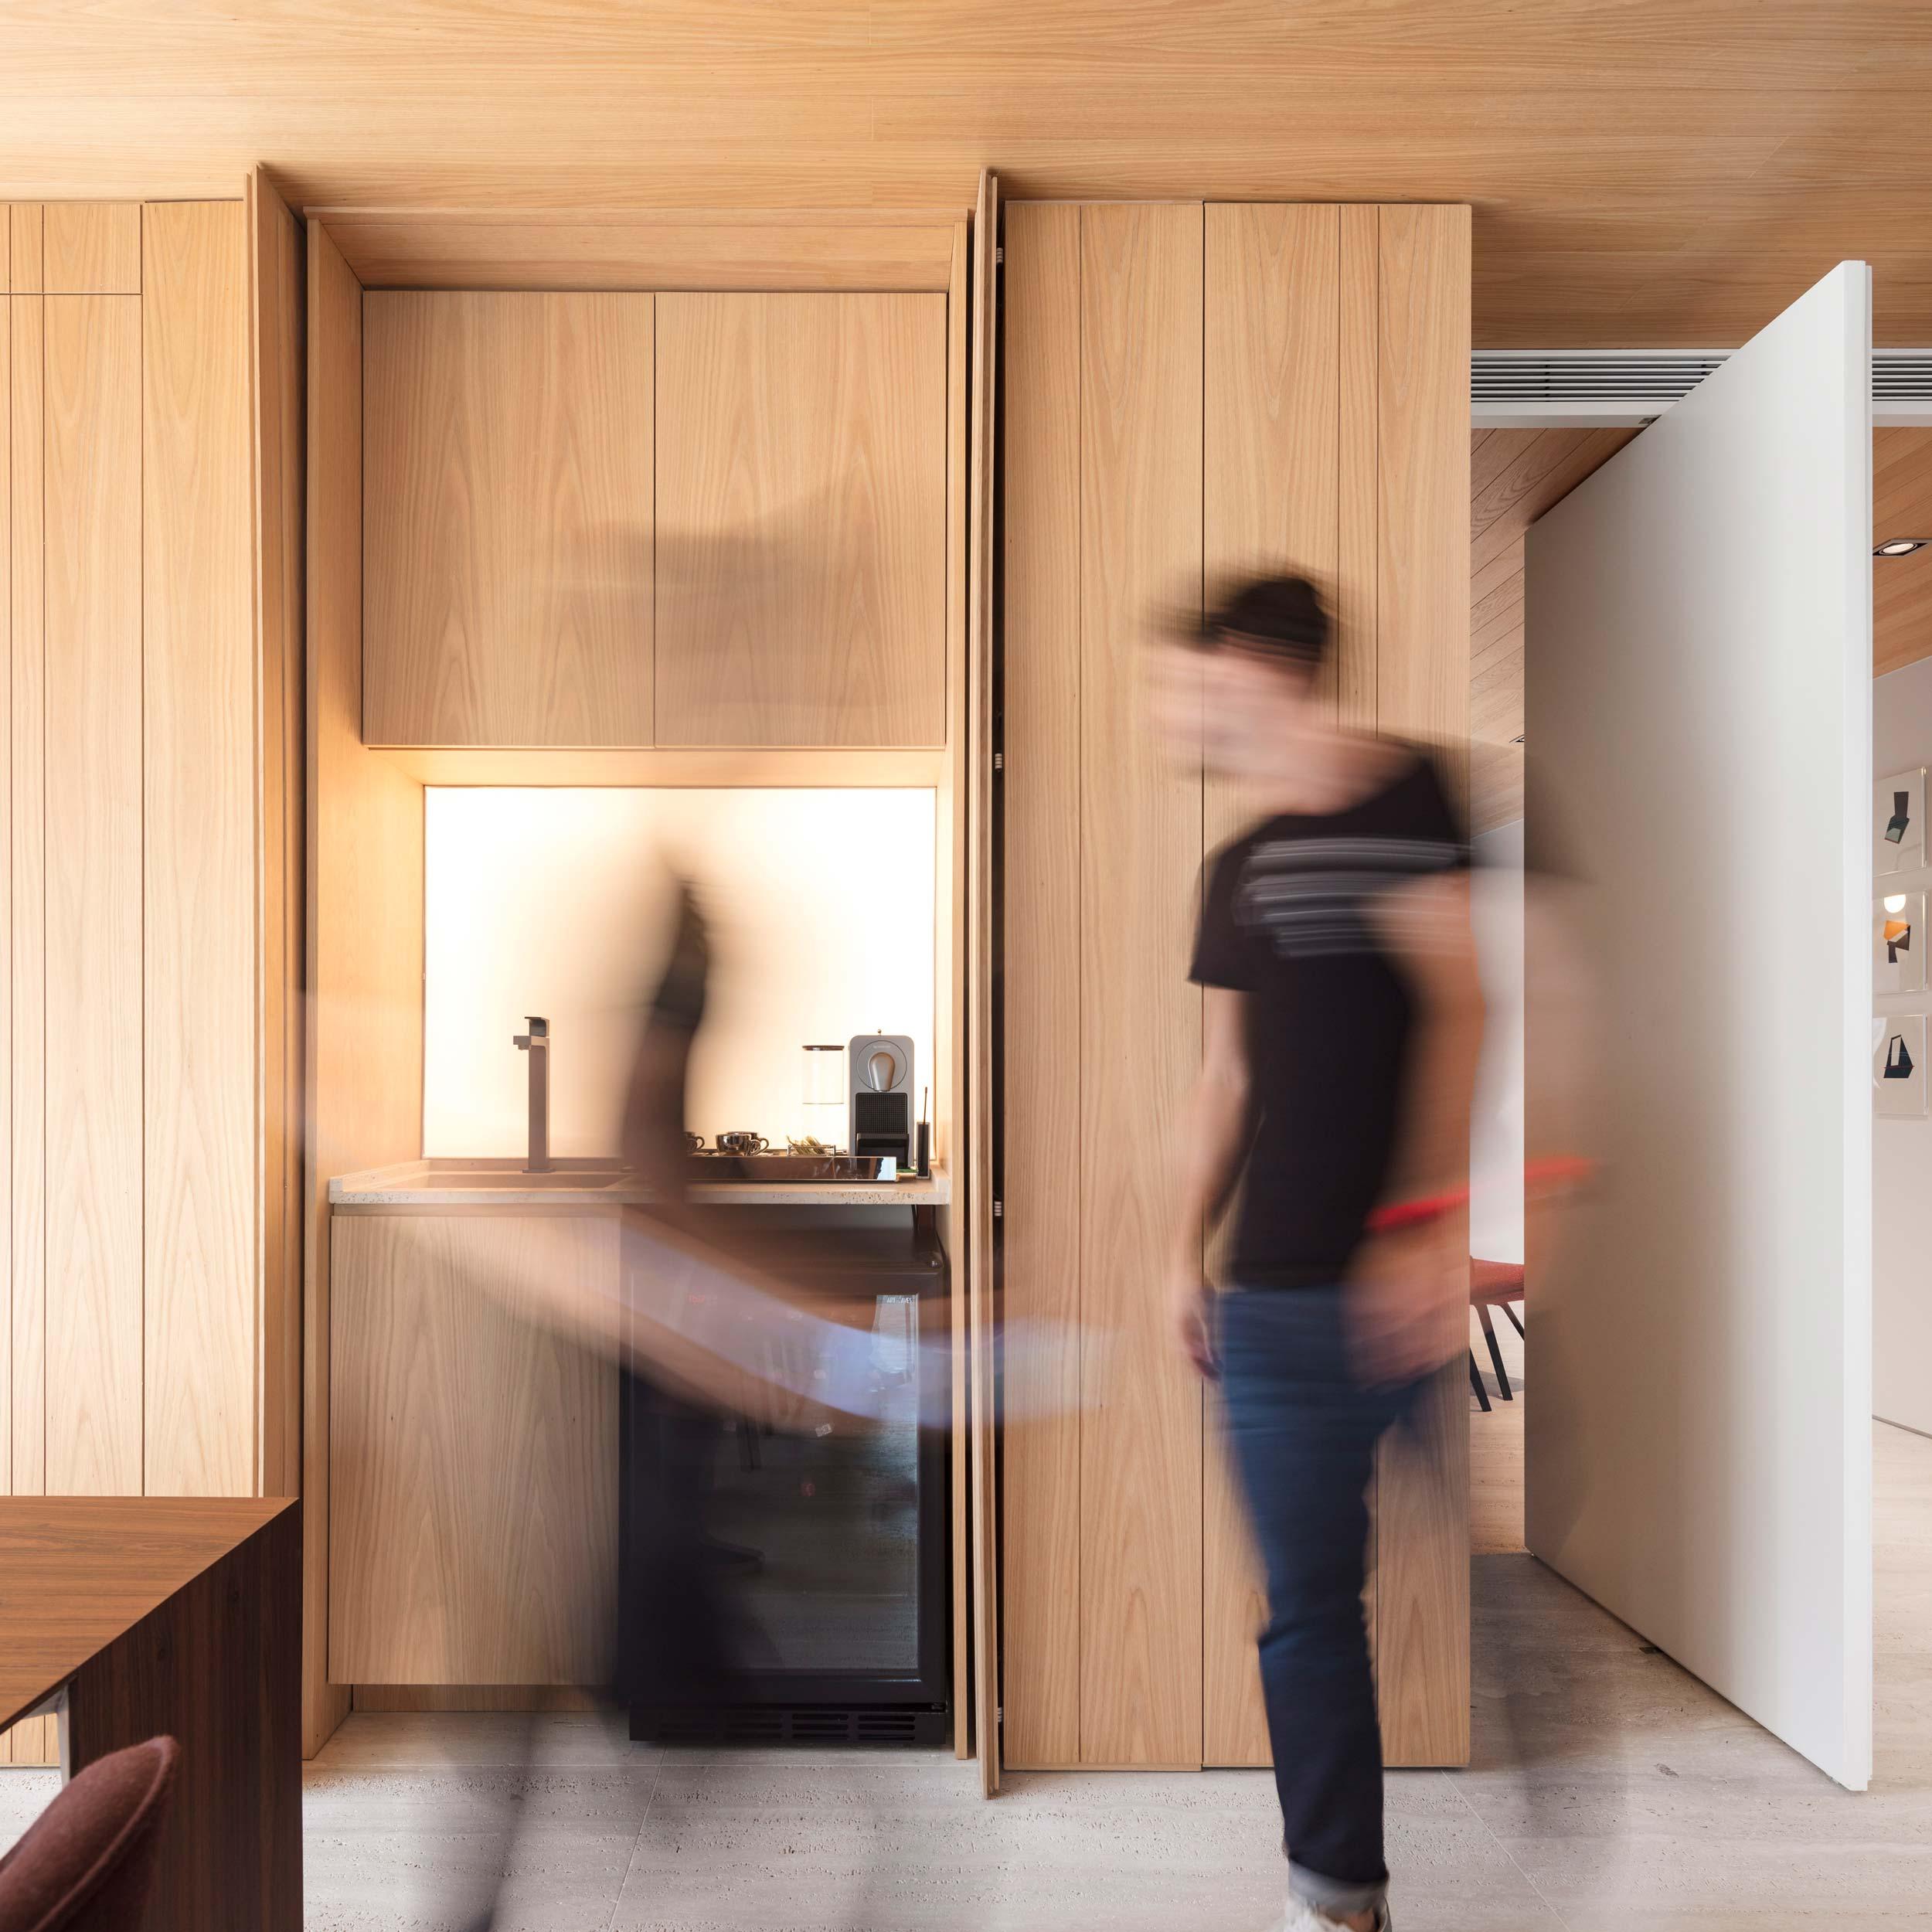 projeto-eretz-fernanda-marques-arquiteta-8.JPG